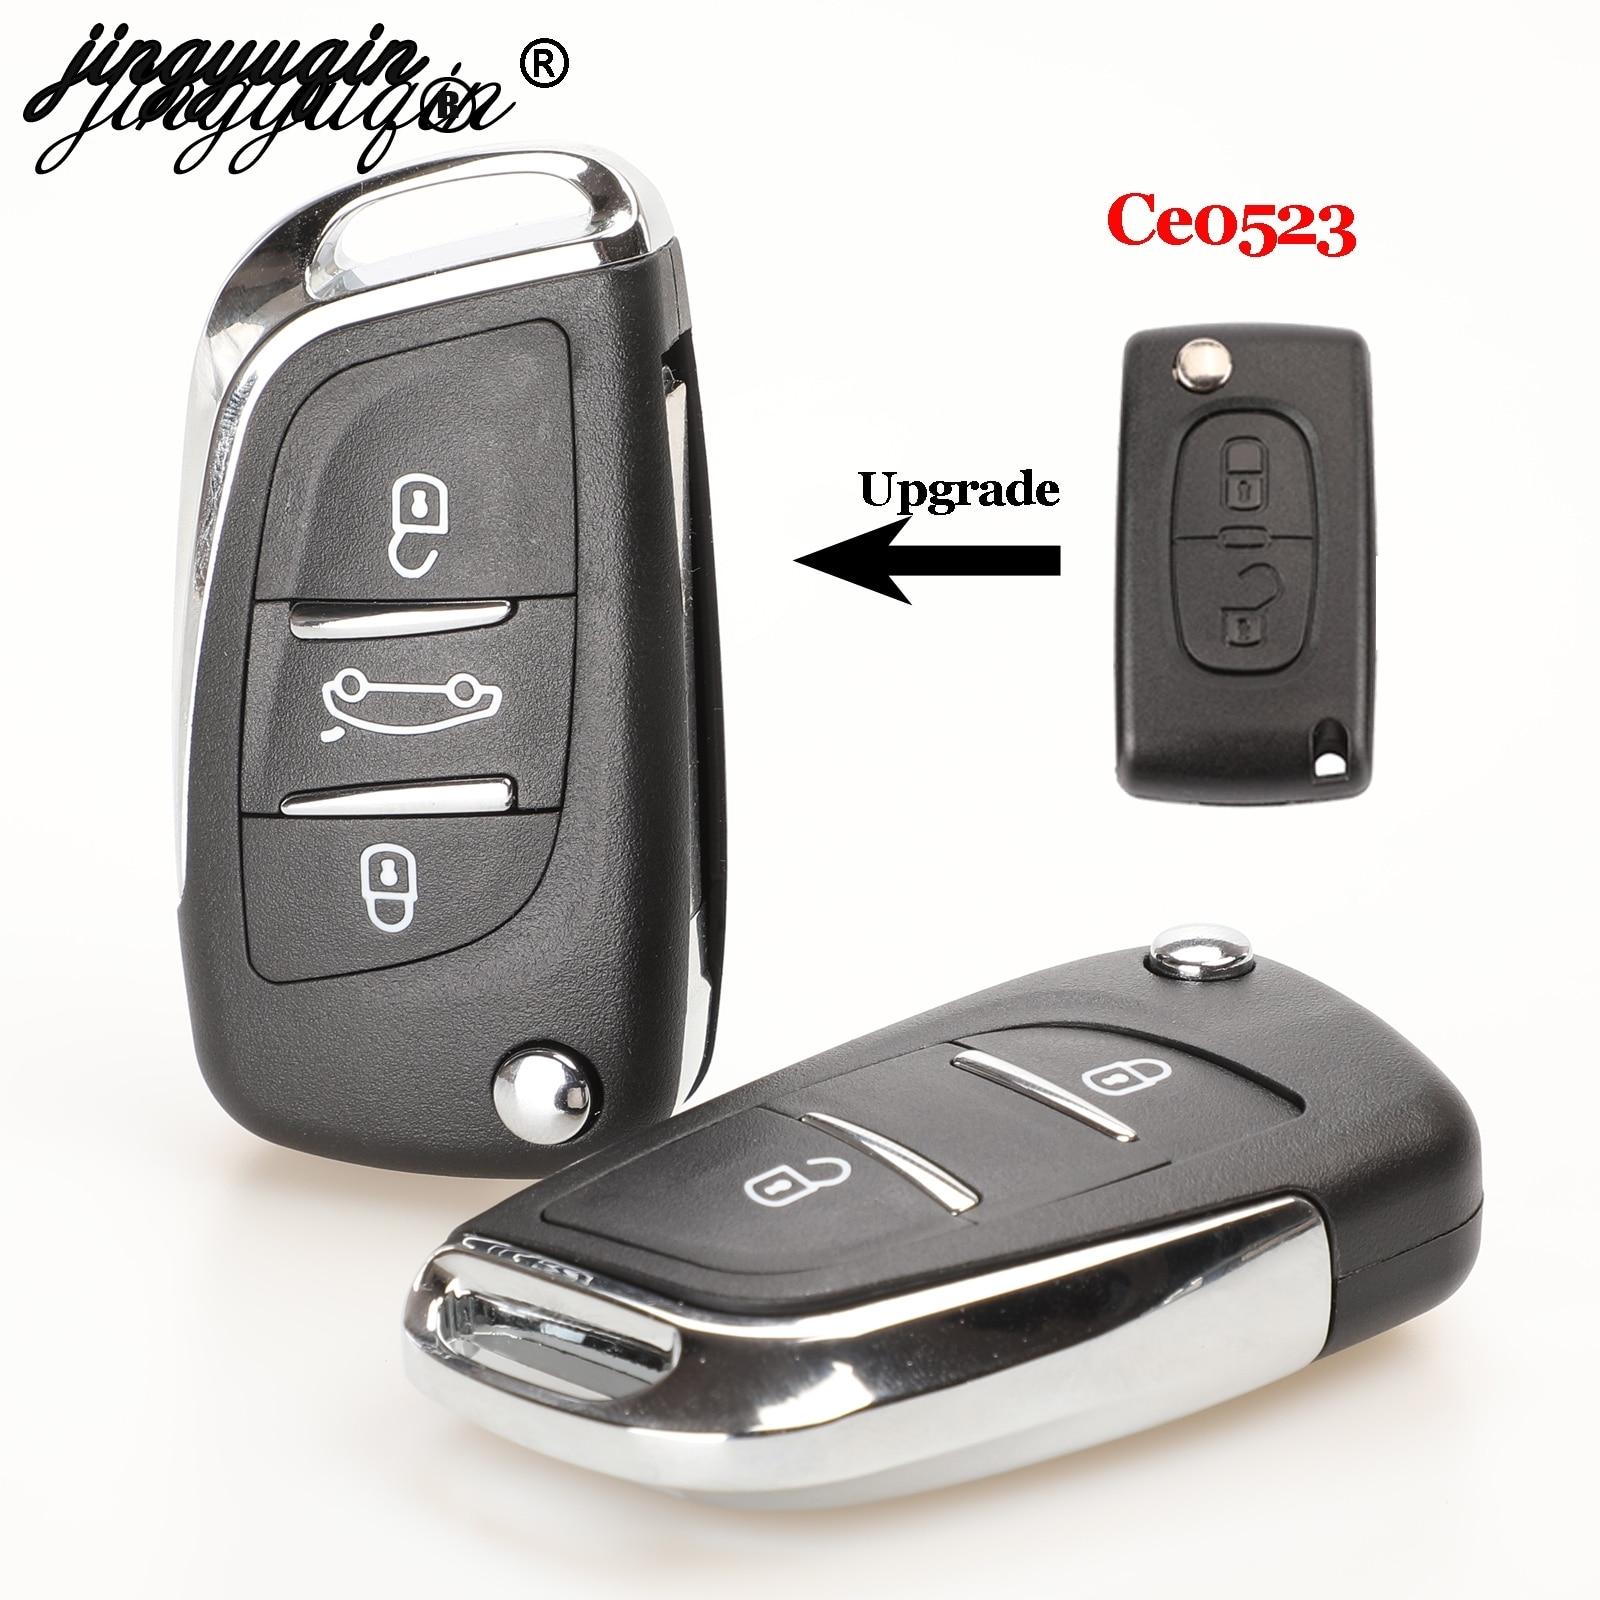 jingyuqin Ce0523 Moodifend remote Car Key Shell for Citroen C5 C4 Coupe VTR C6 C8 C2 Berlingo Xsara Picasso CE0523 VA2/HU83 2/3B